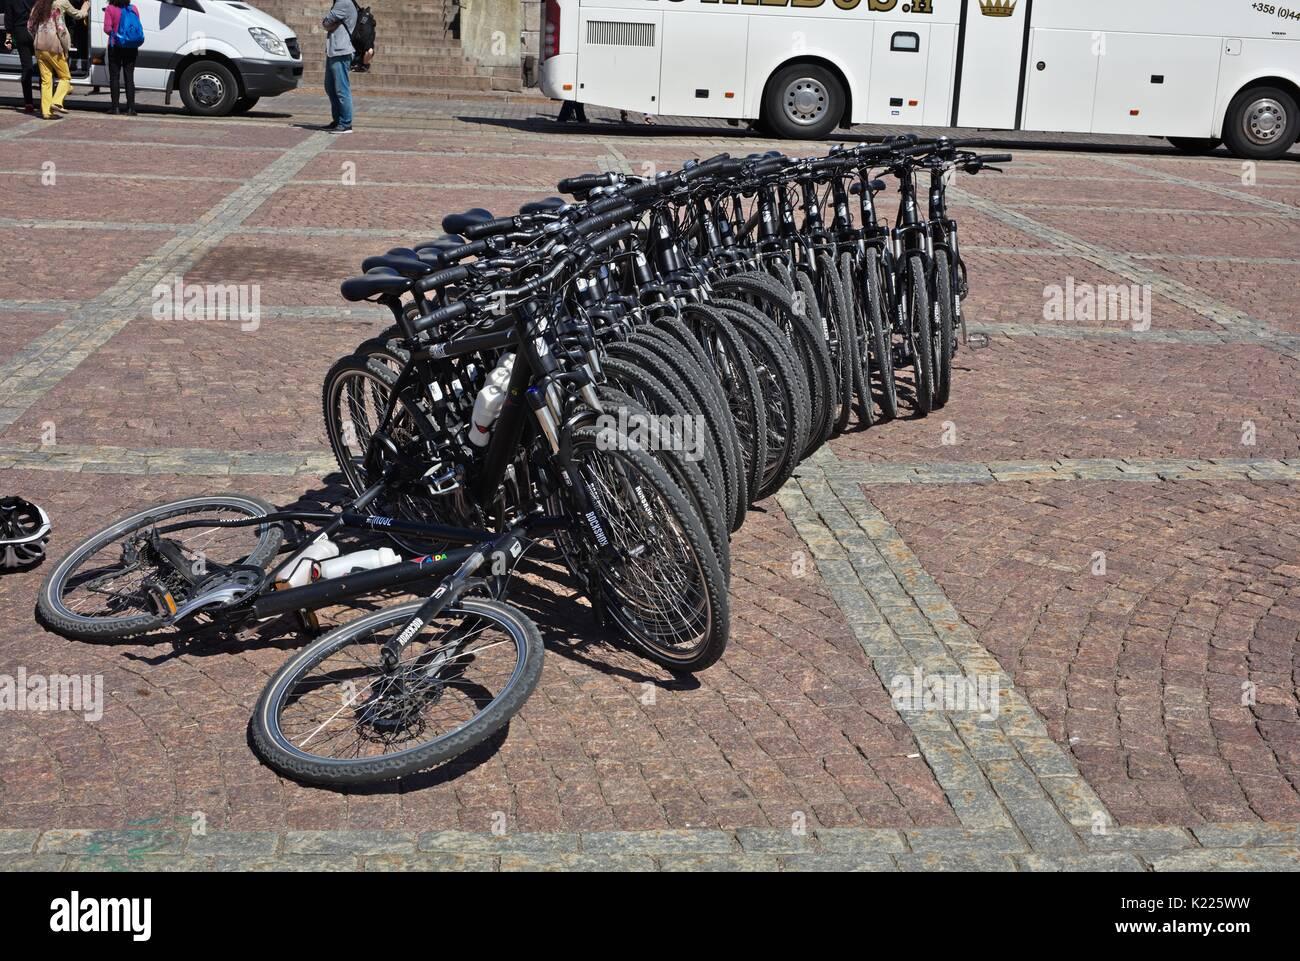 Aida cruise ship bicycles - Stock Image